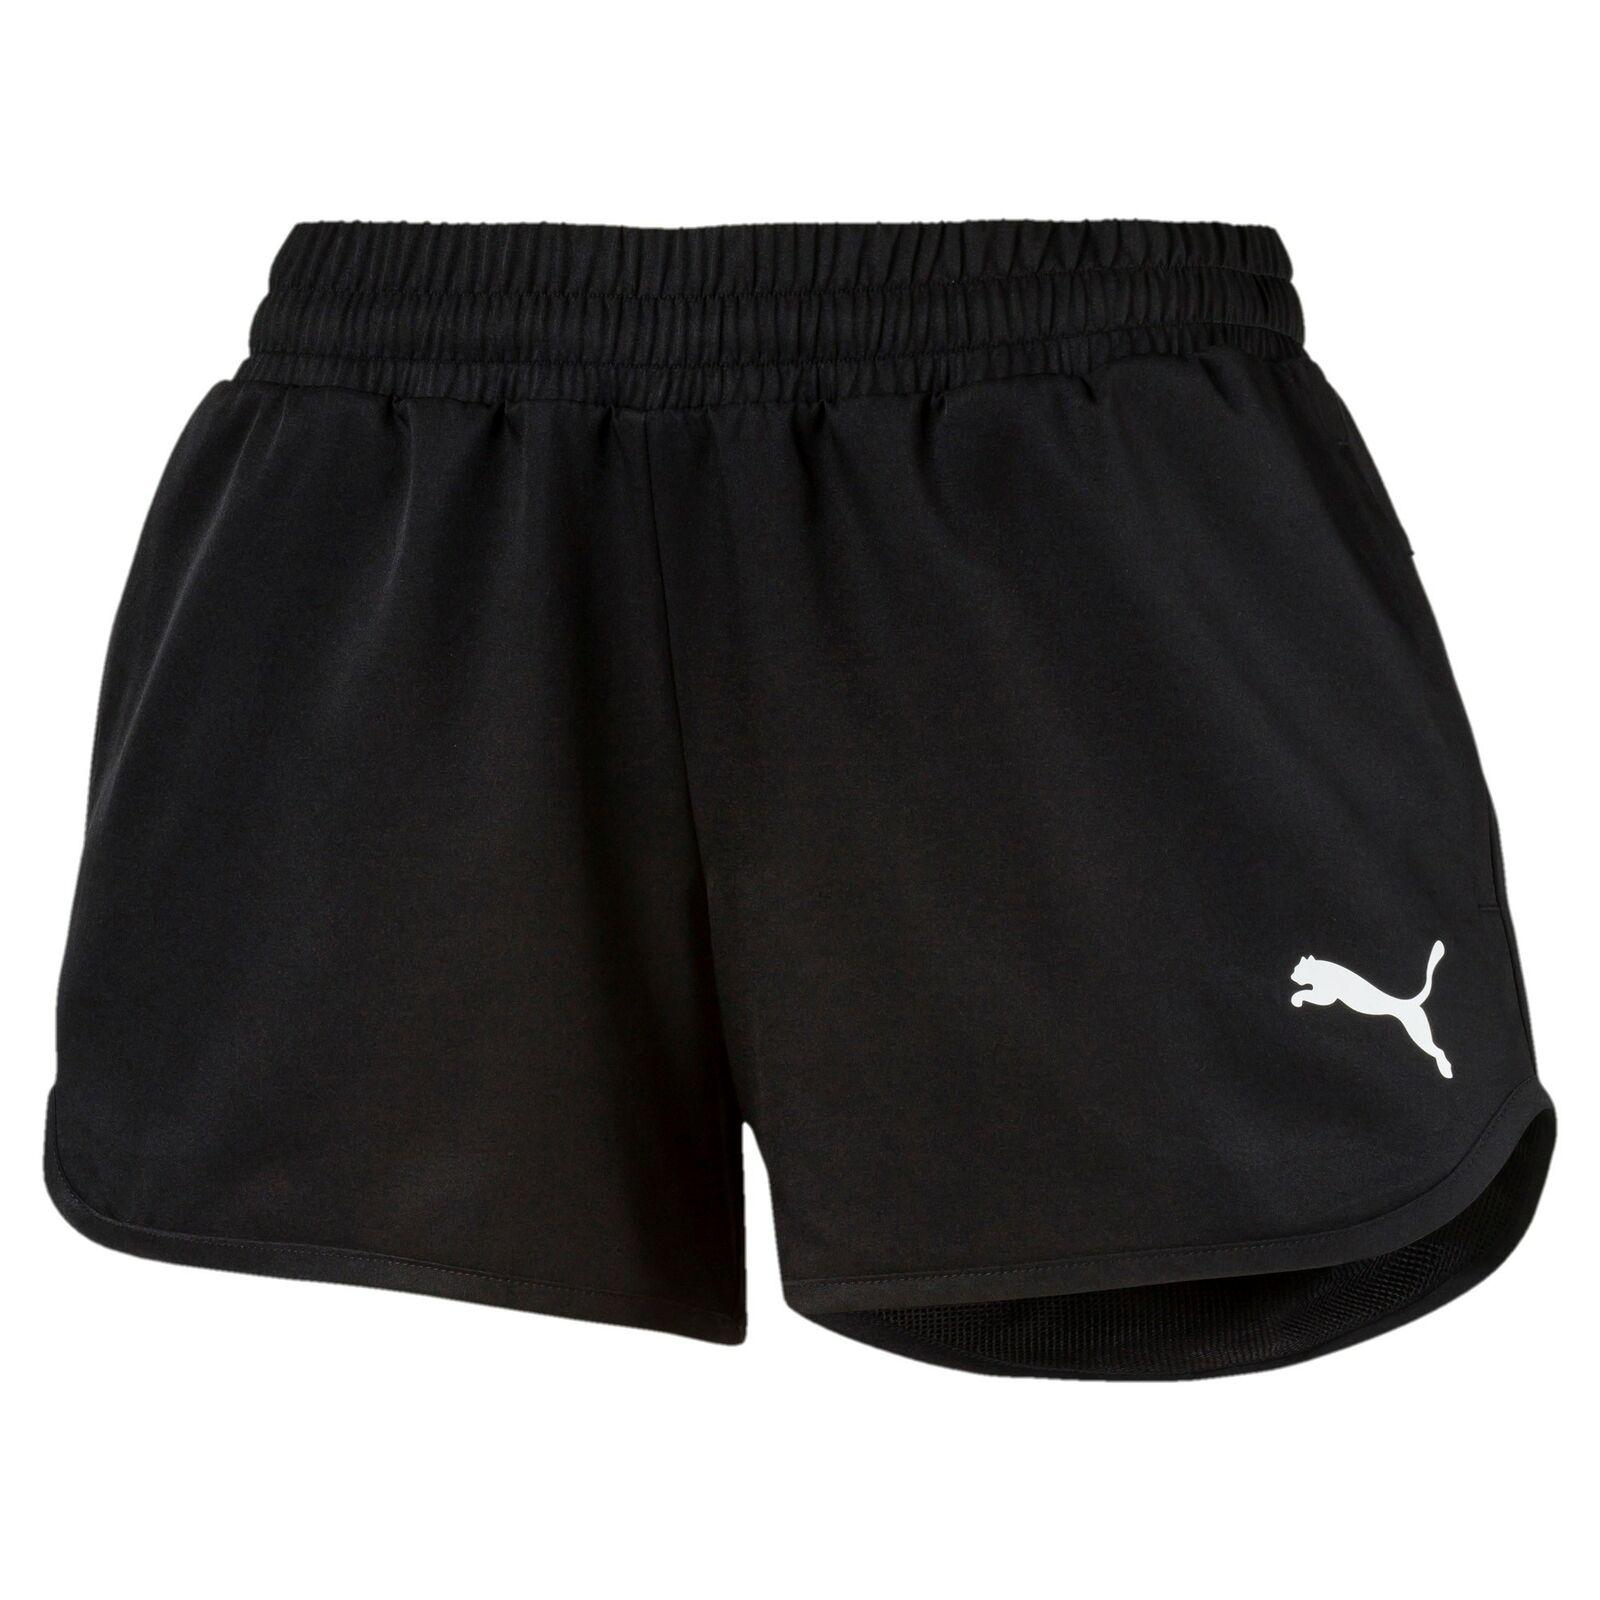 PUMA Damen Sport Active Woven Shorts Puma Black Schwarz in S M L - NEU